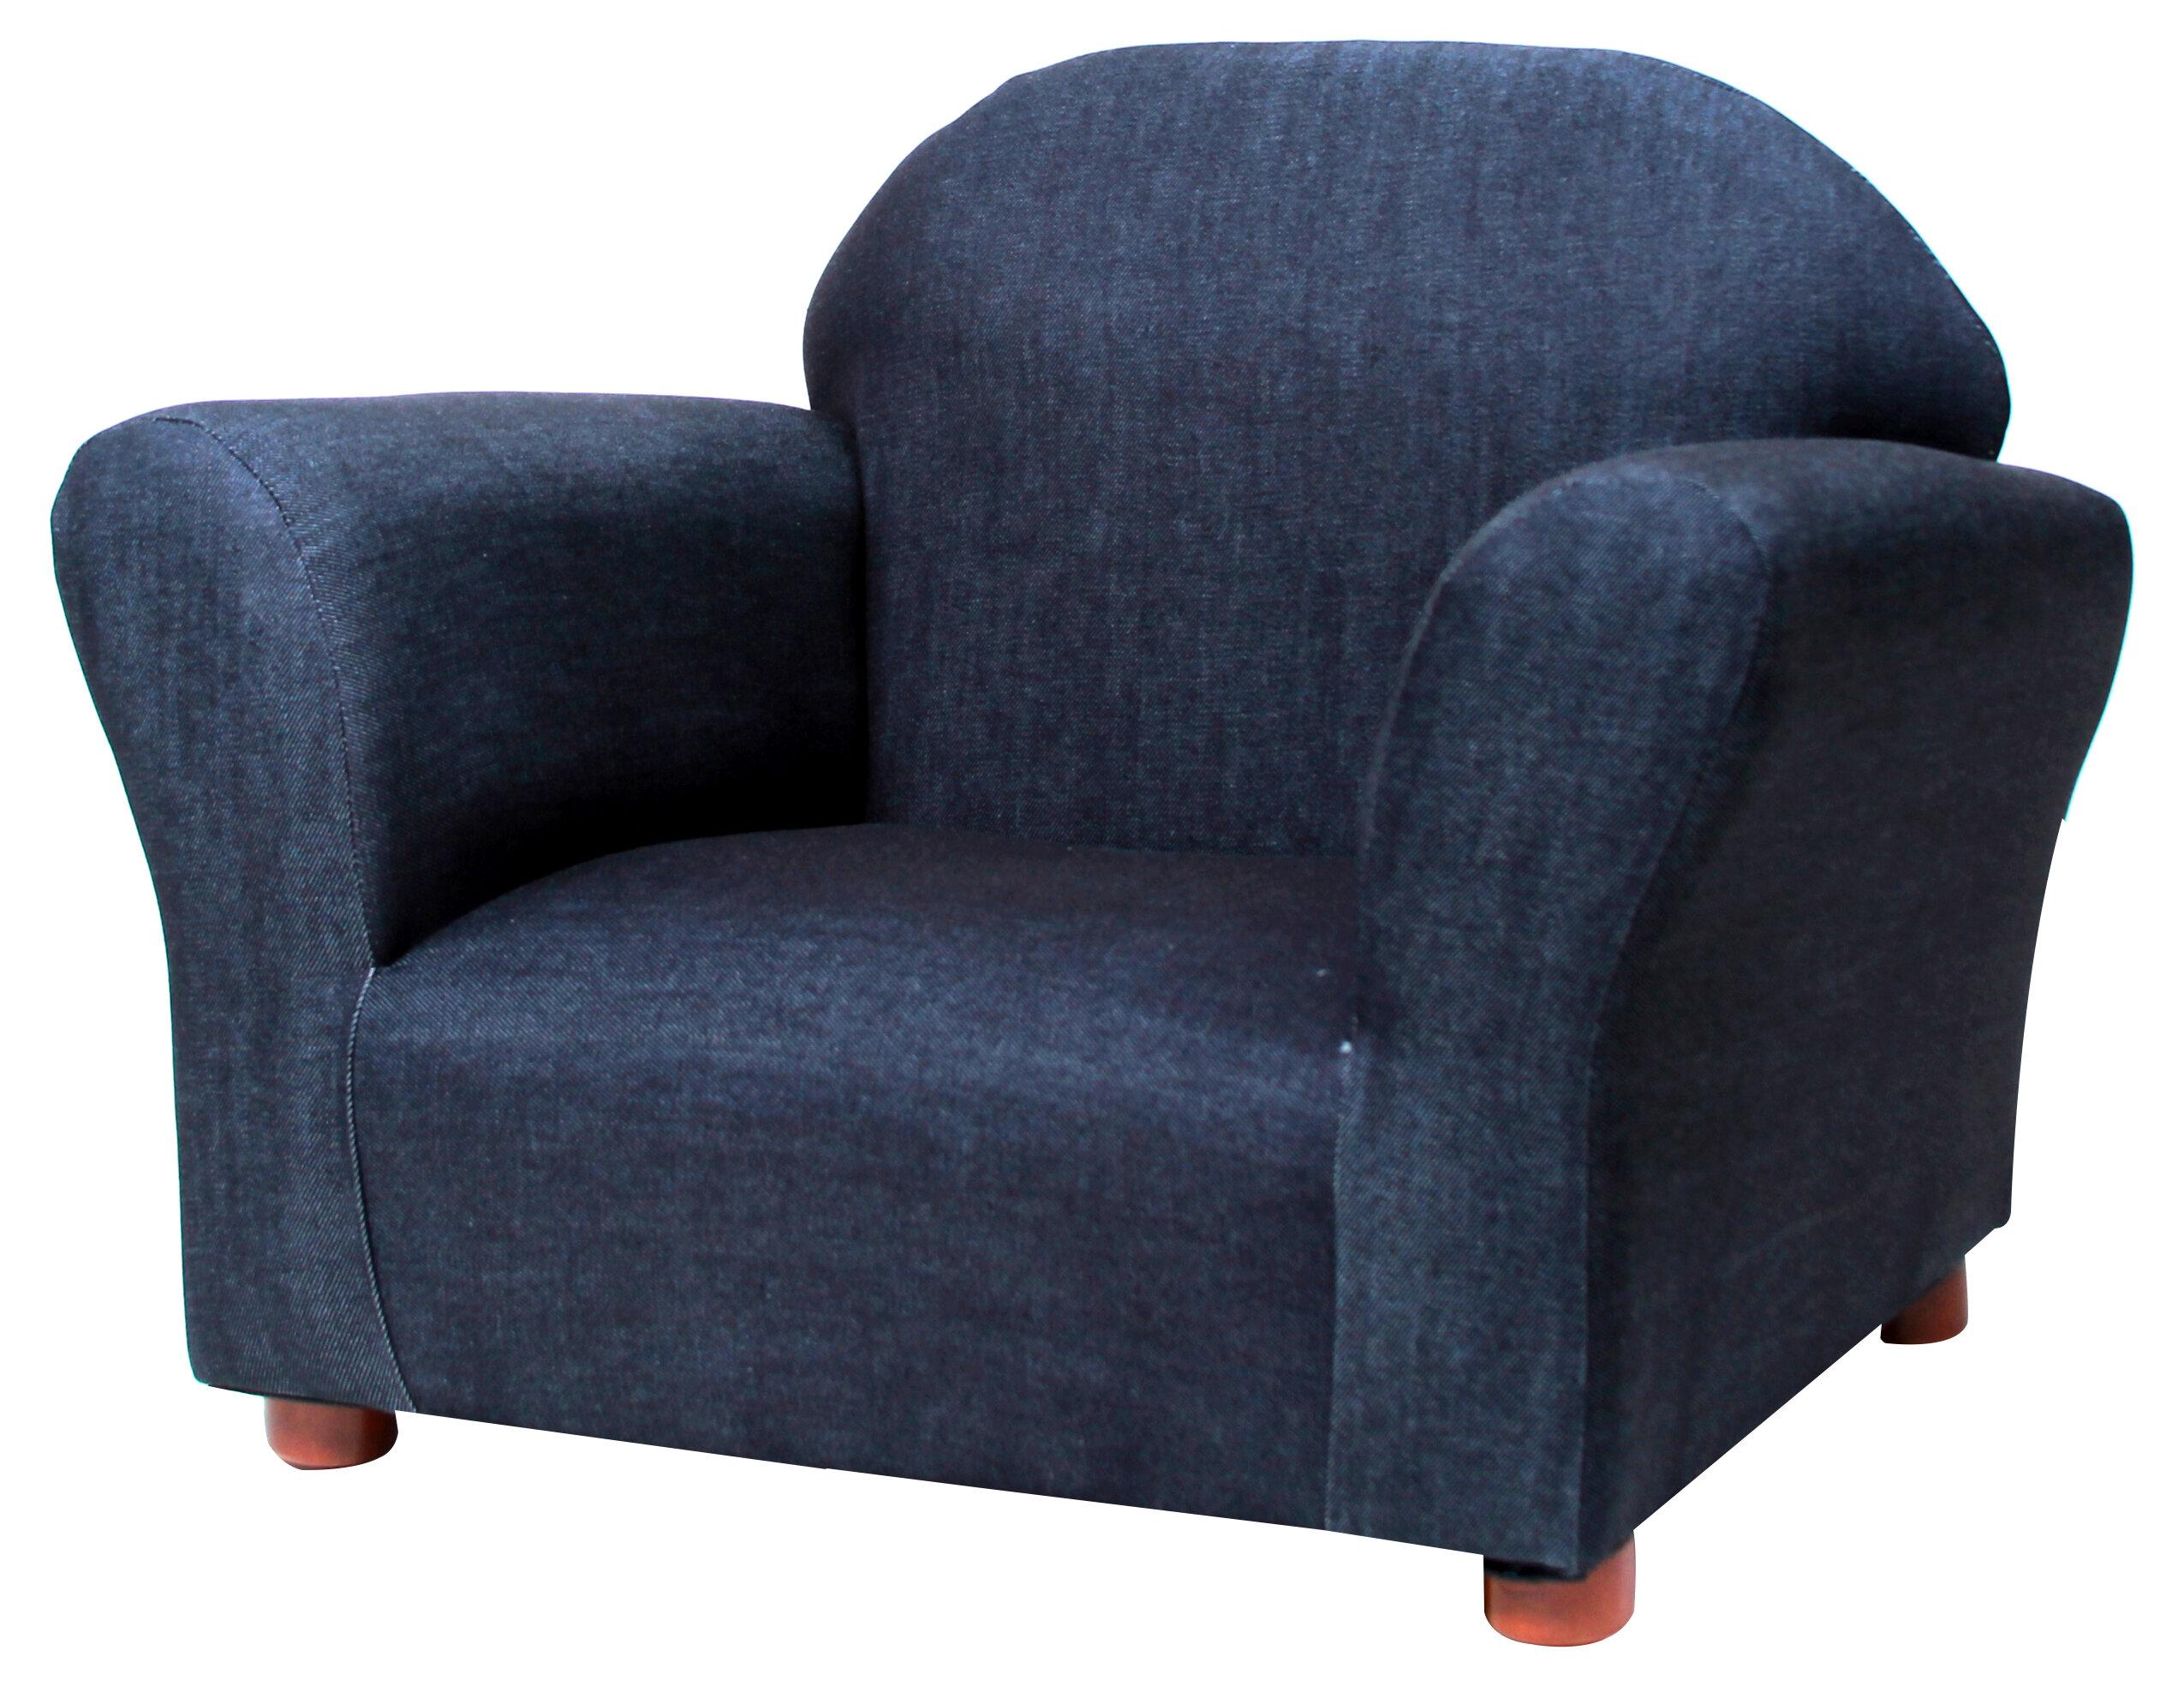 Harriet Bee Ellie Kids Cotton Club Chair Reviews Wayfair